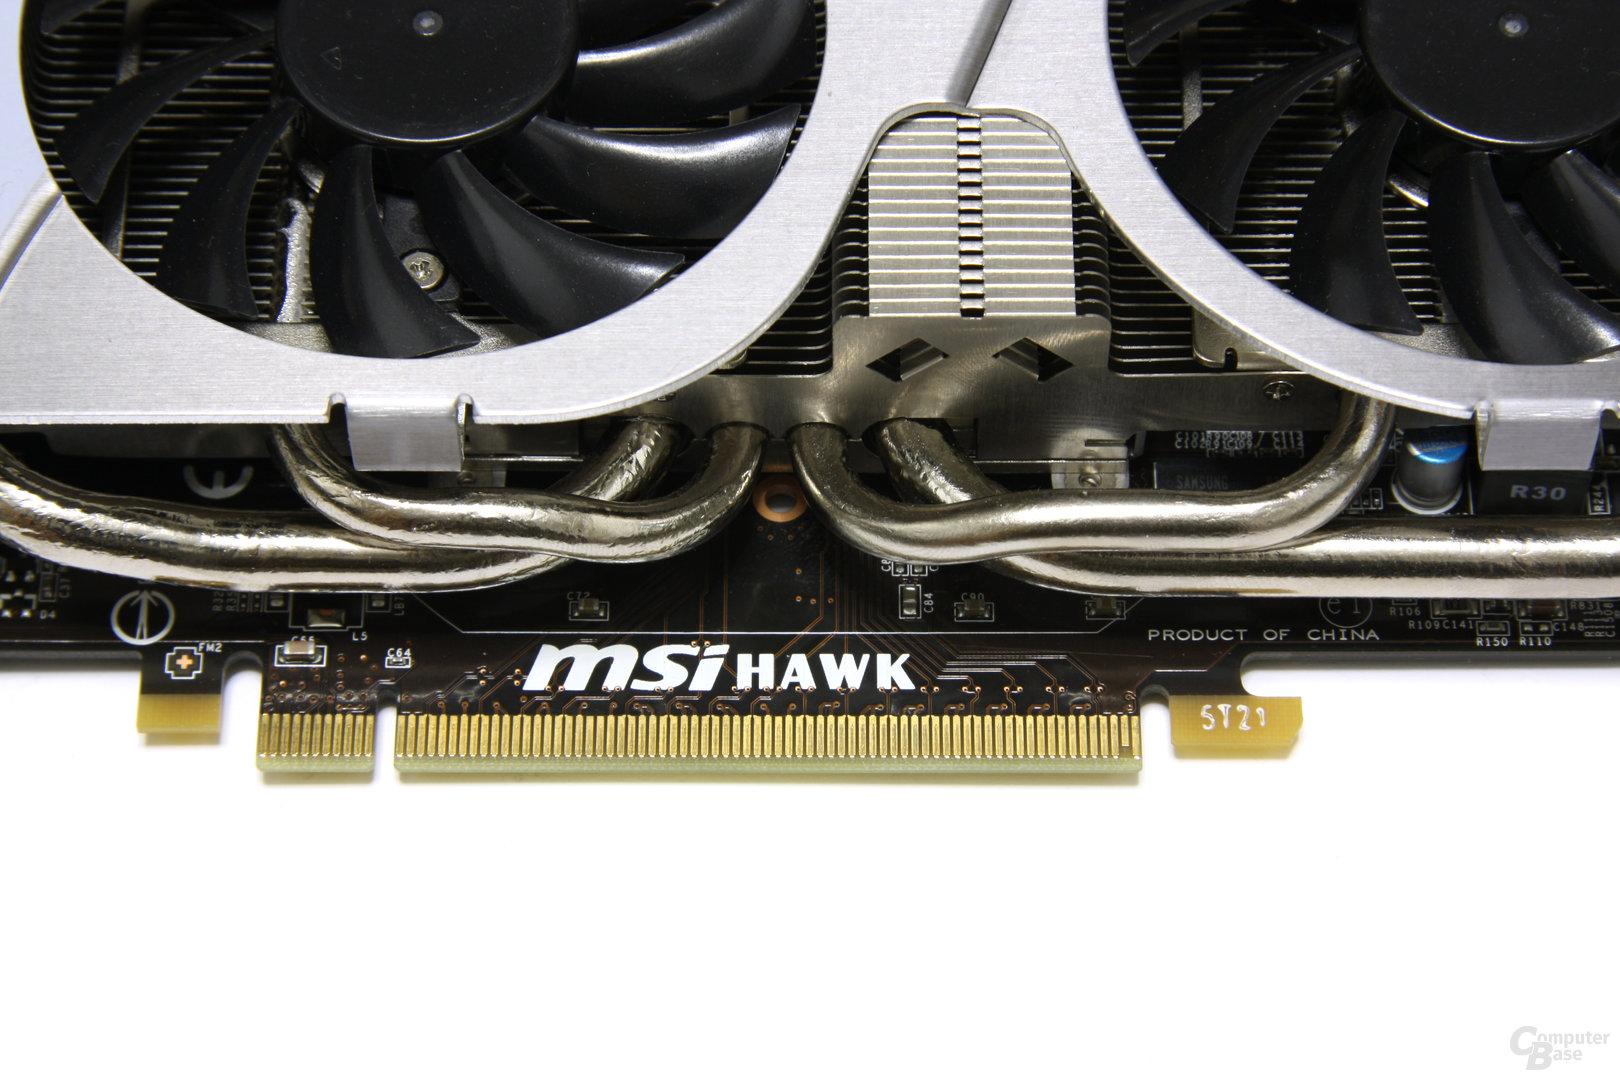 GeForce GTX 460 Hawk Heatpipes